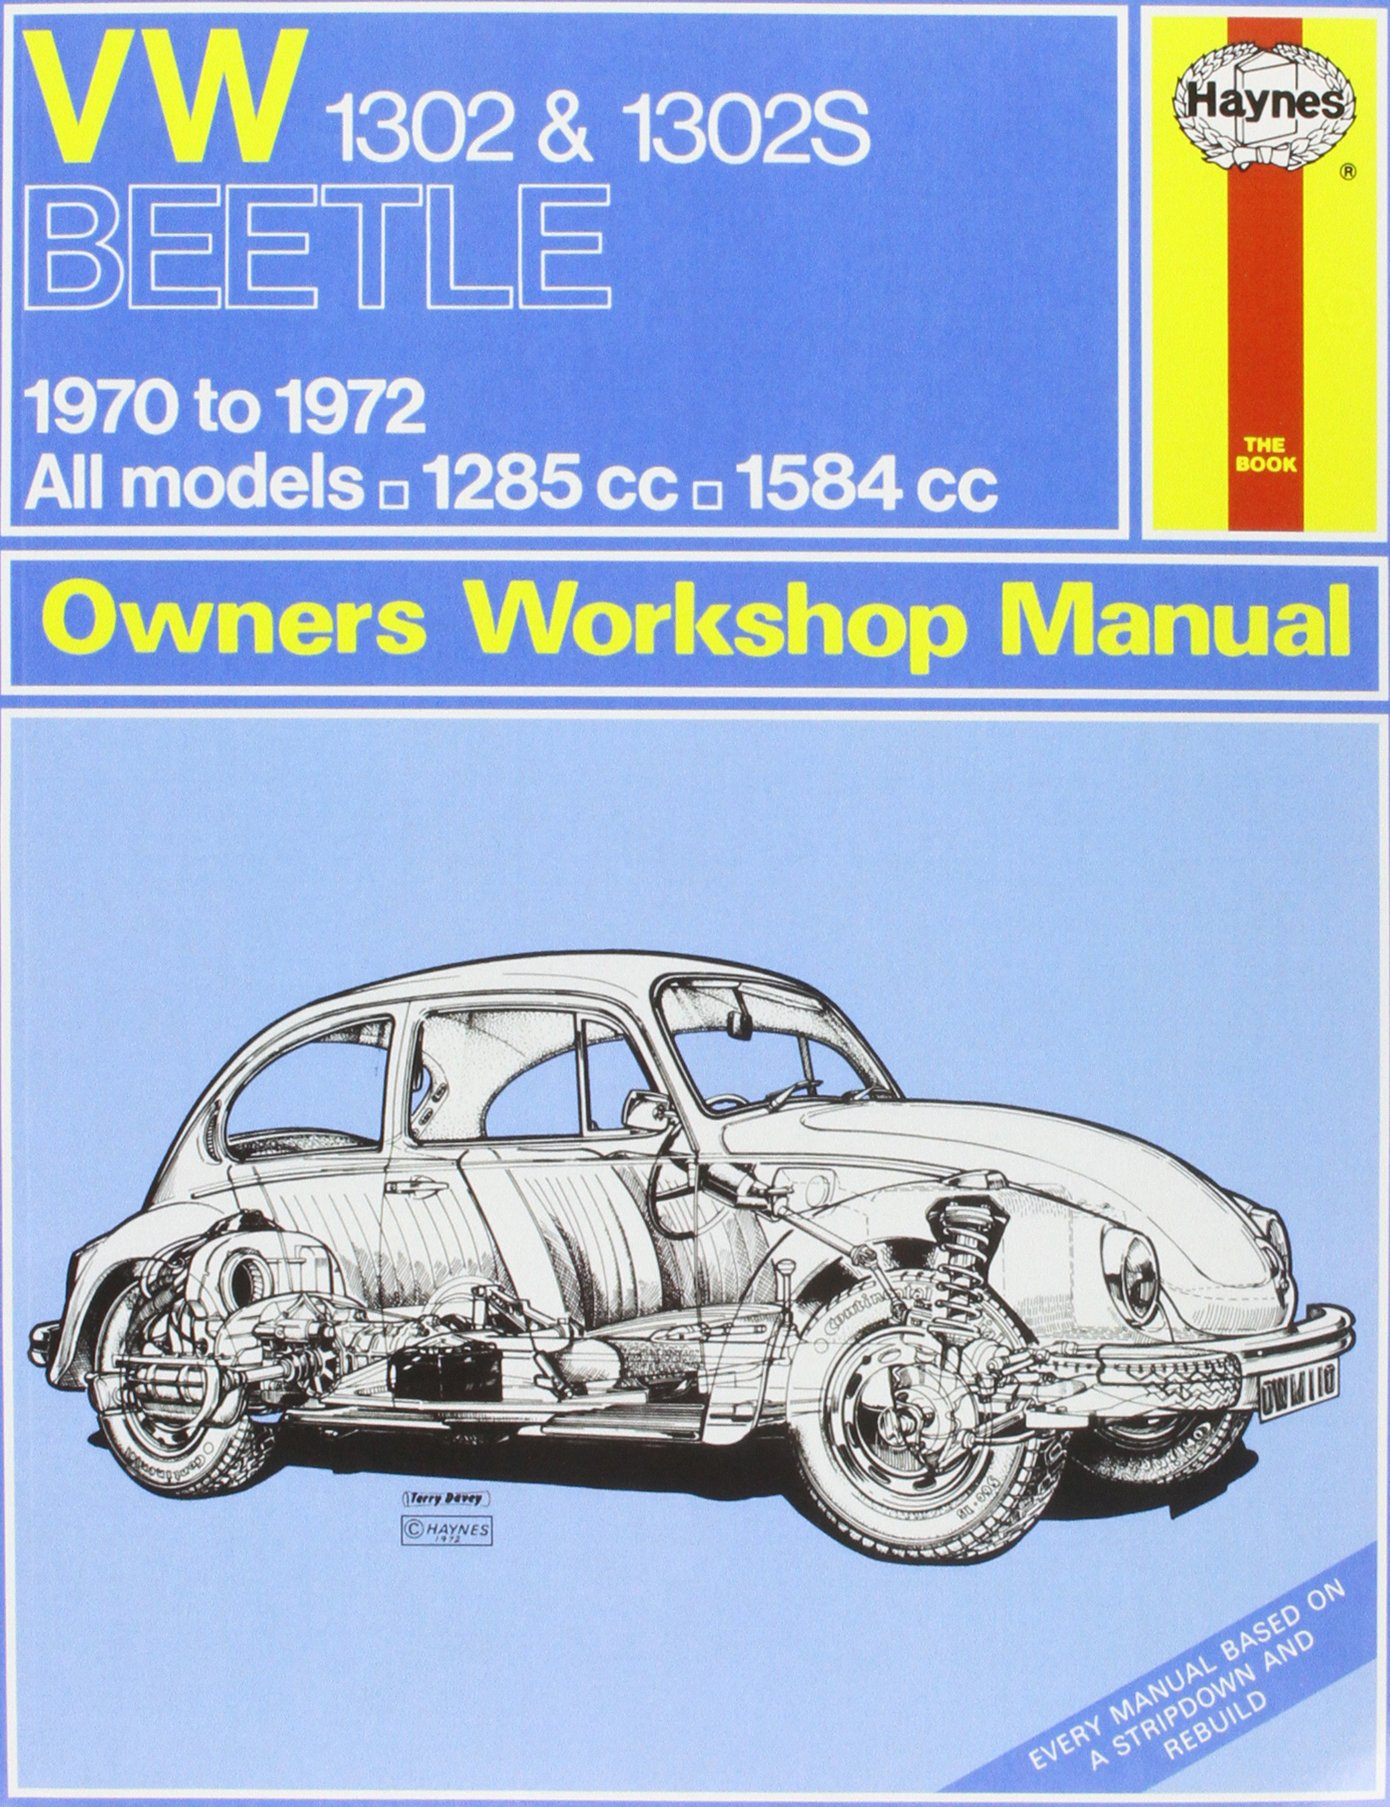 beetle repair manuals ebook rh beetle repair manuals ebook tempower us